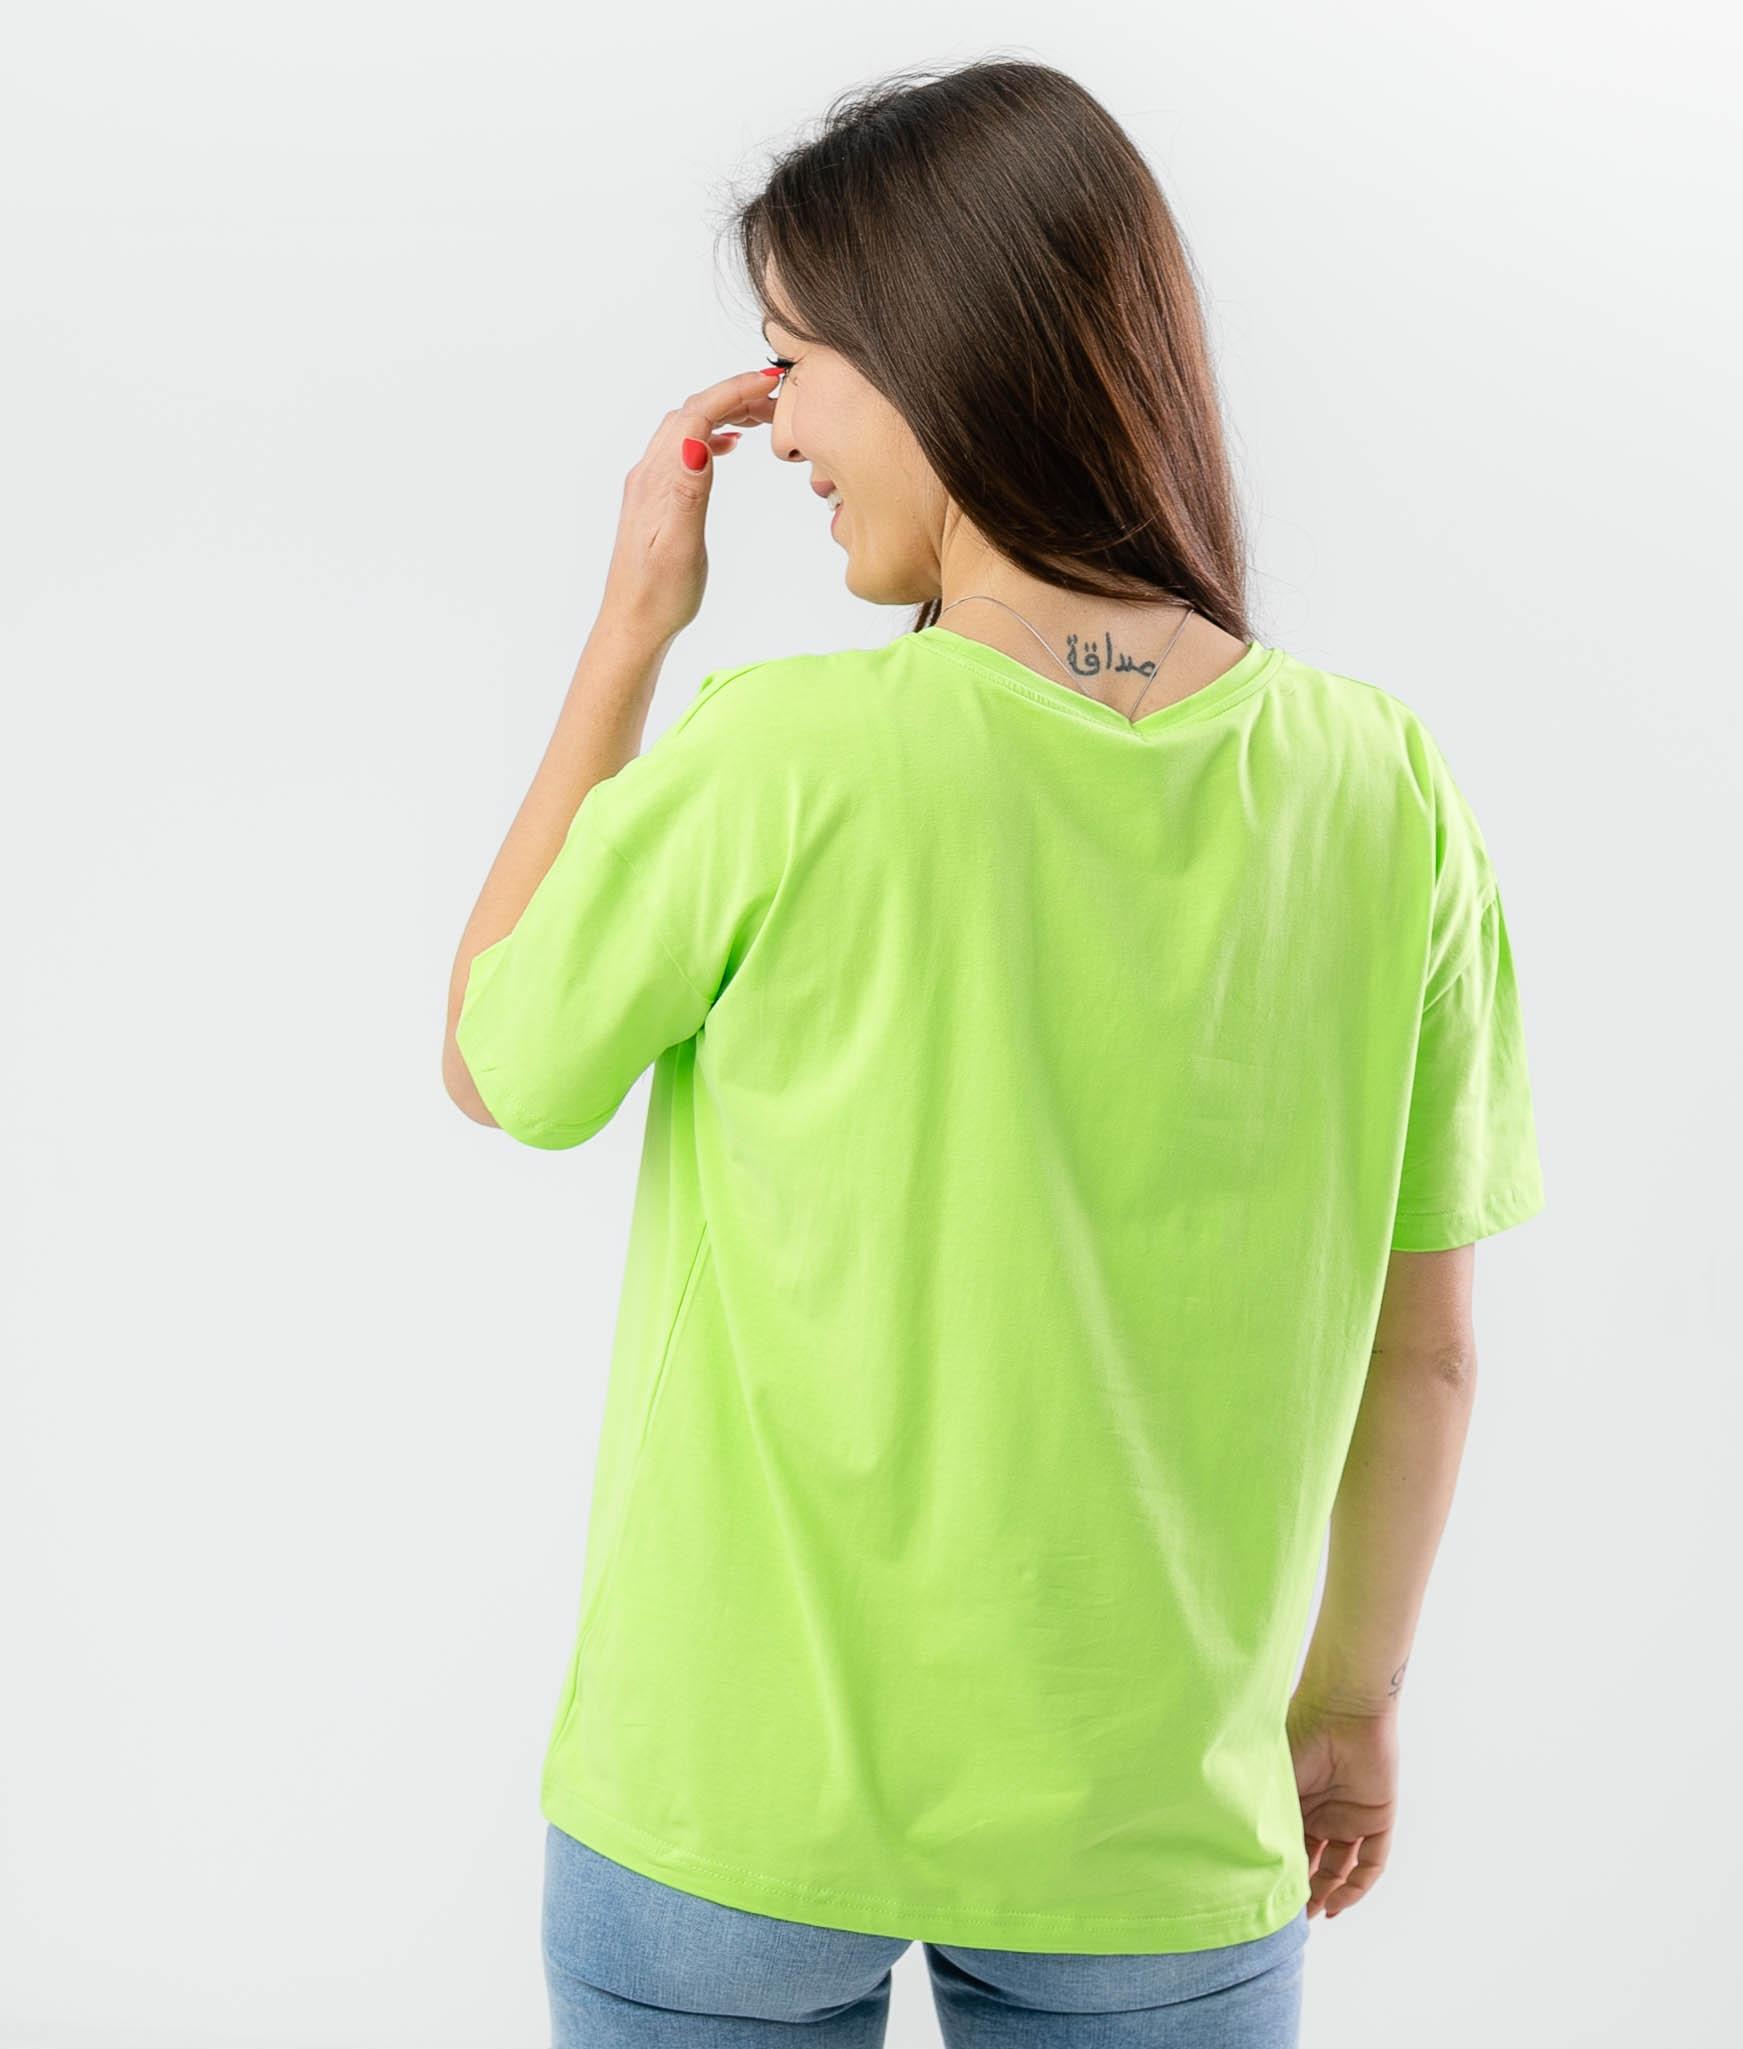 Camiseta Bademi - Verde